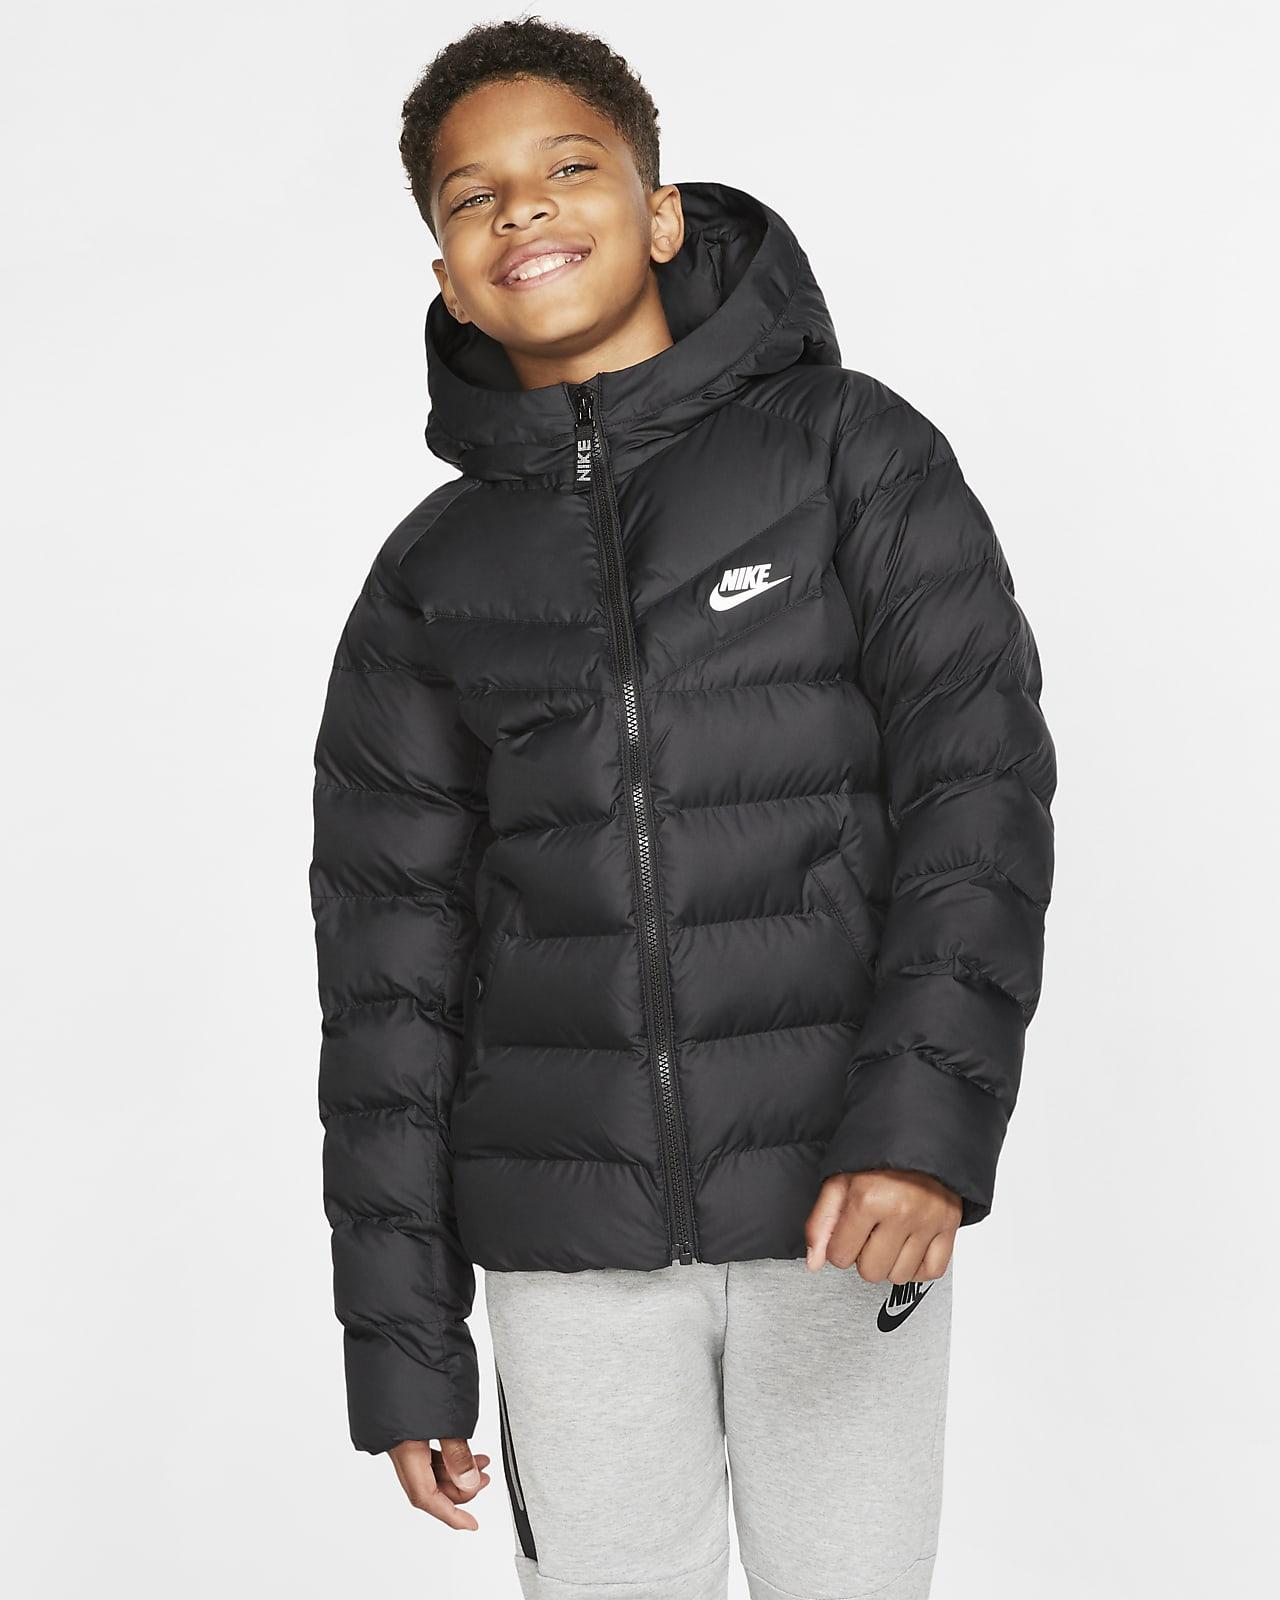 Casaco Nike Sportswear Júnior